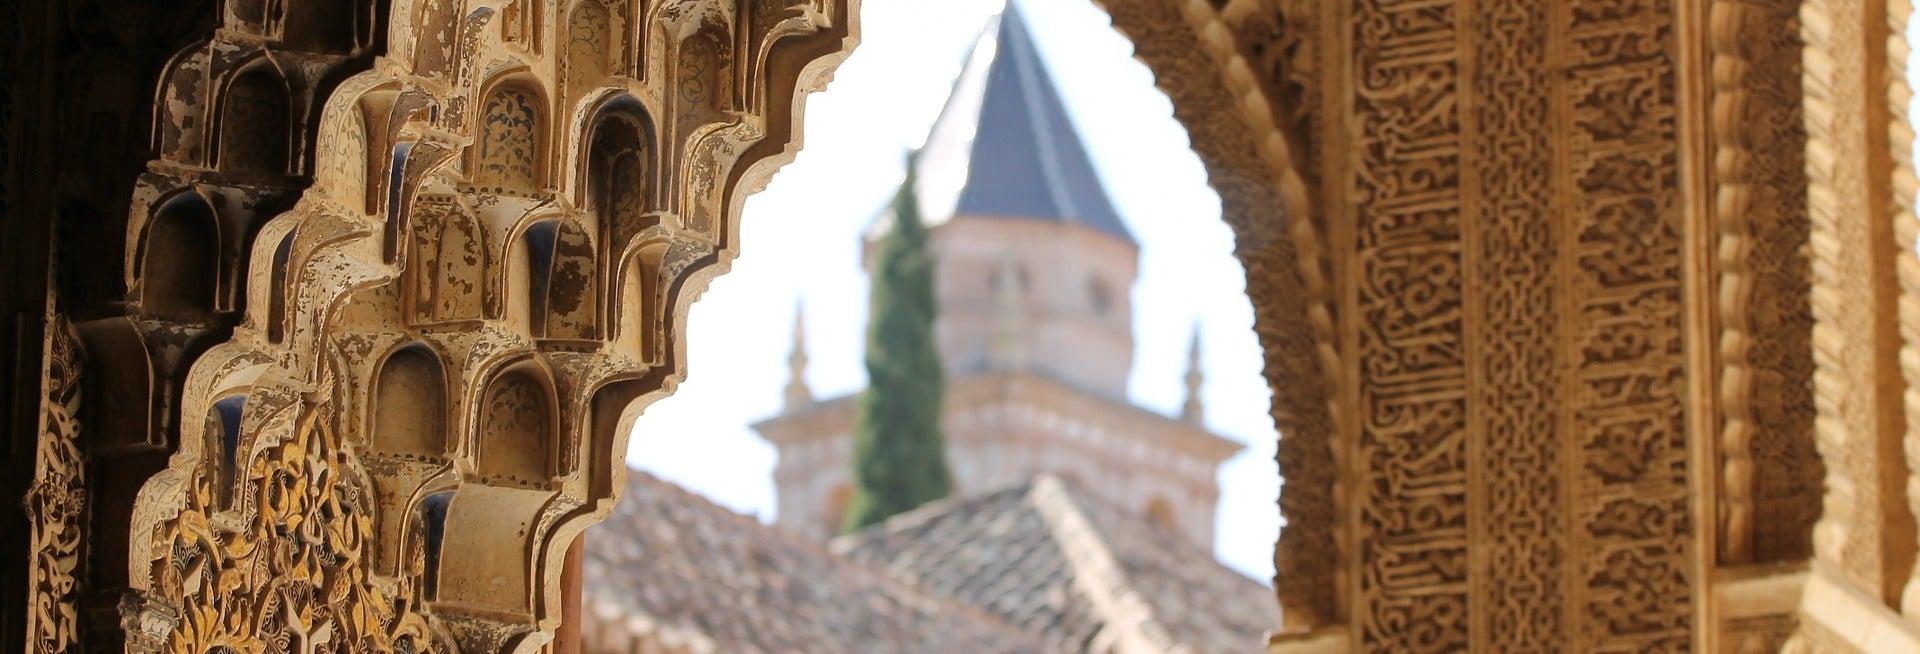 Offerta: Alhambra + Albayzín e Sacromonte